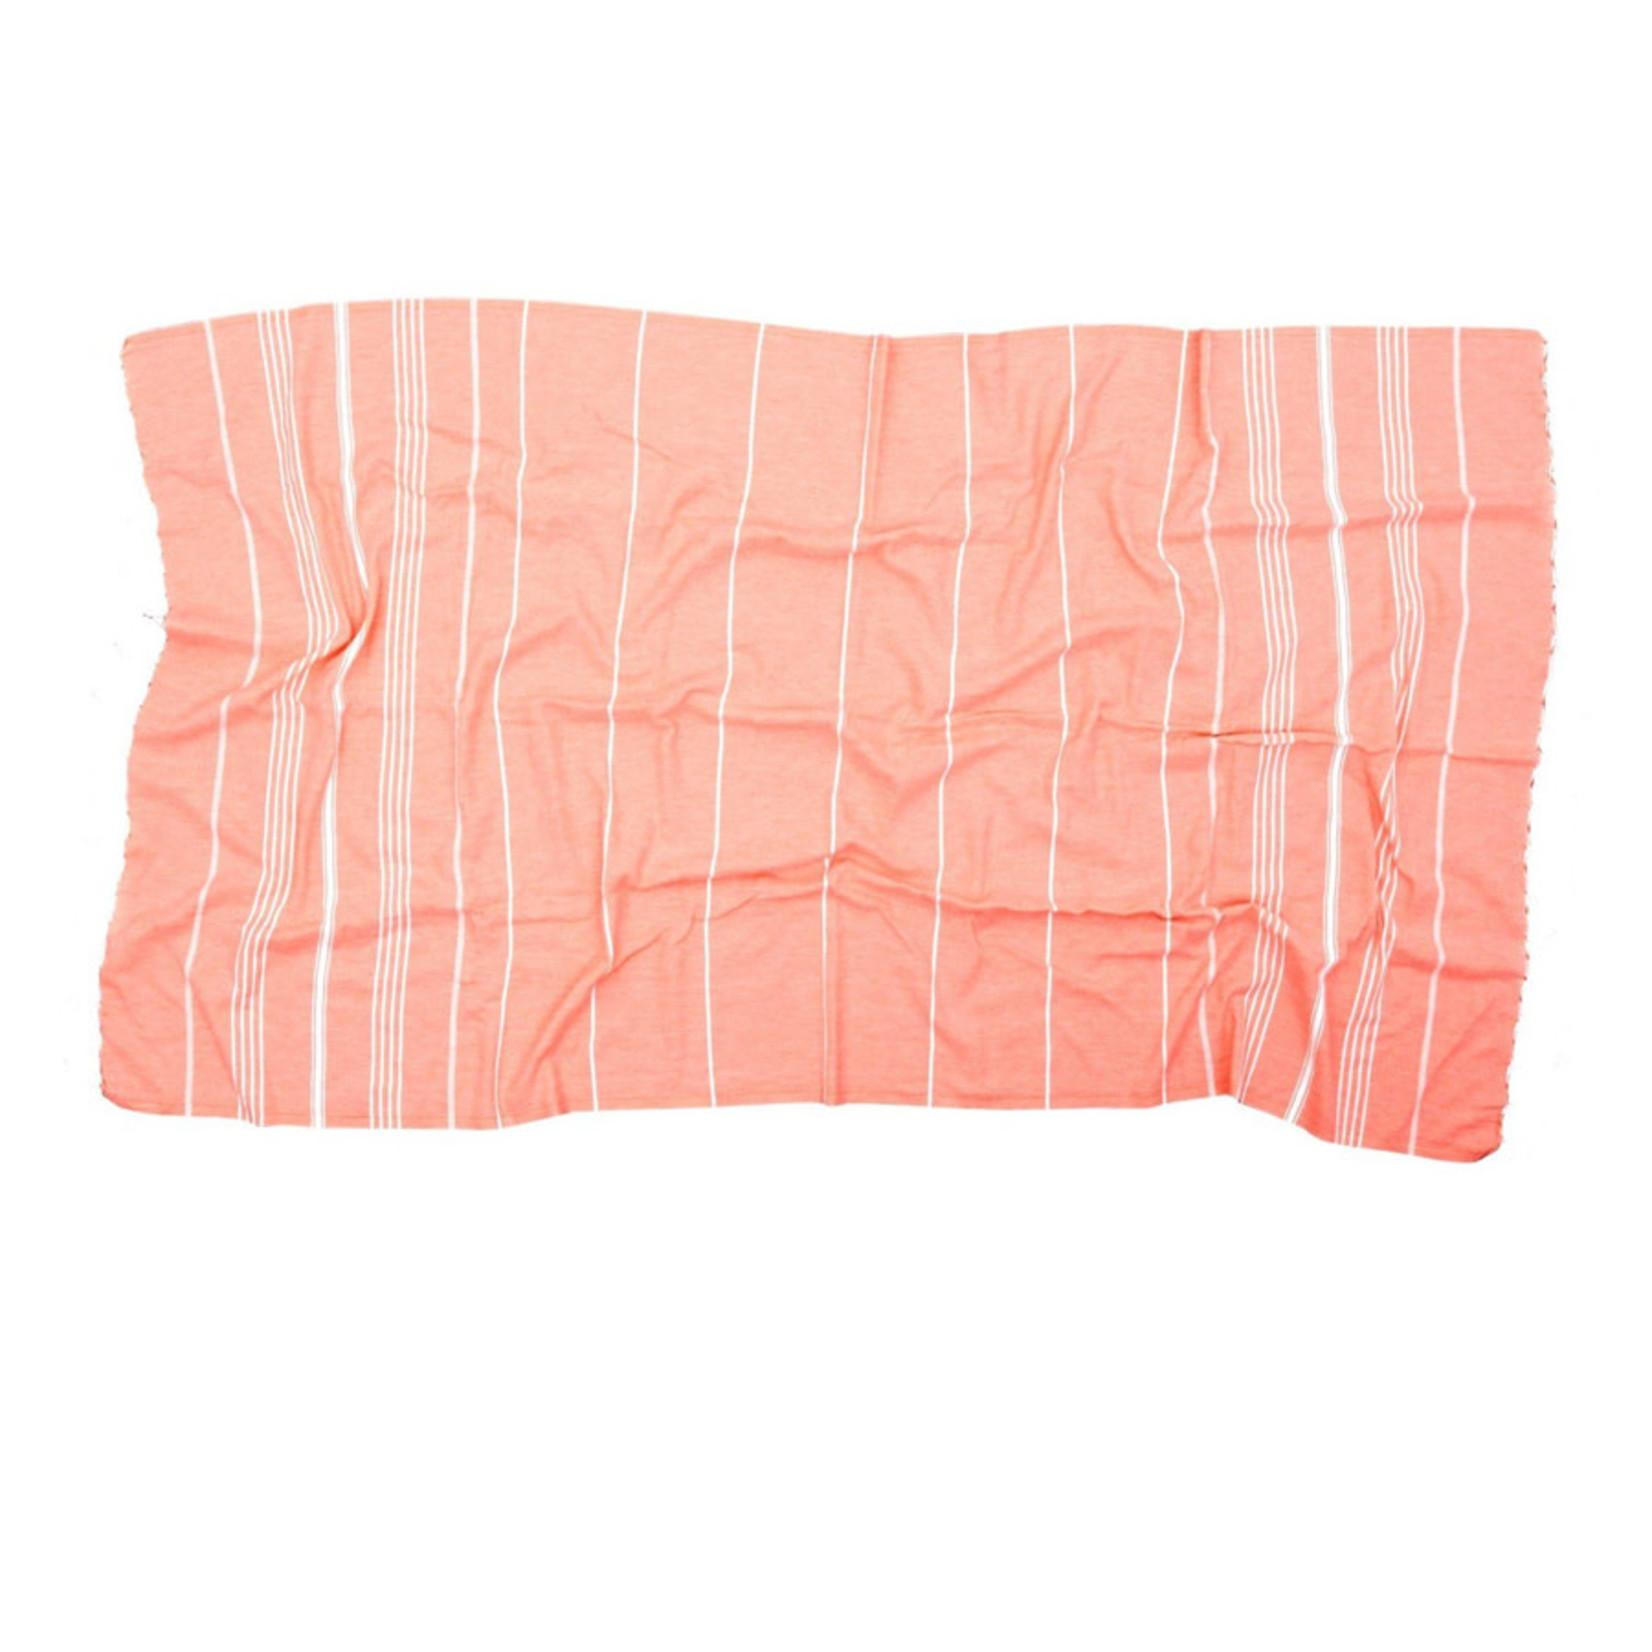 Riviera Towel Company Essential Blanket